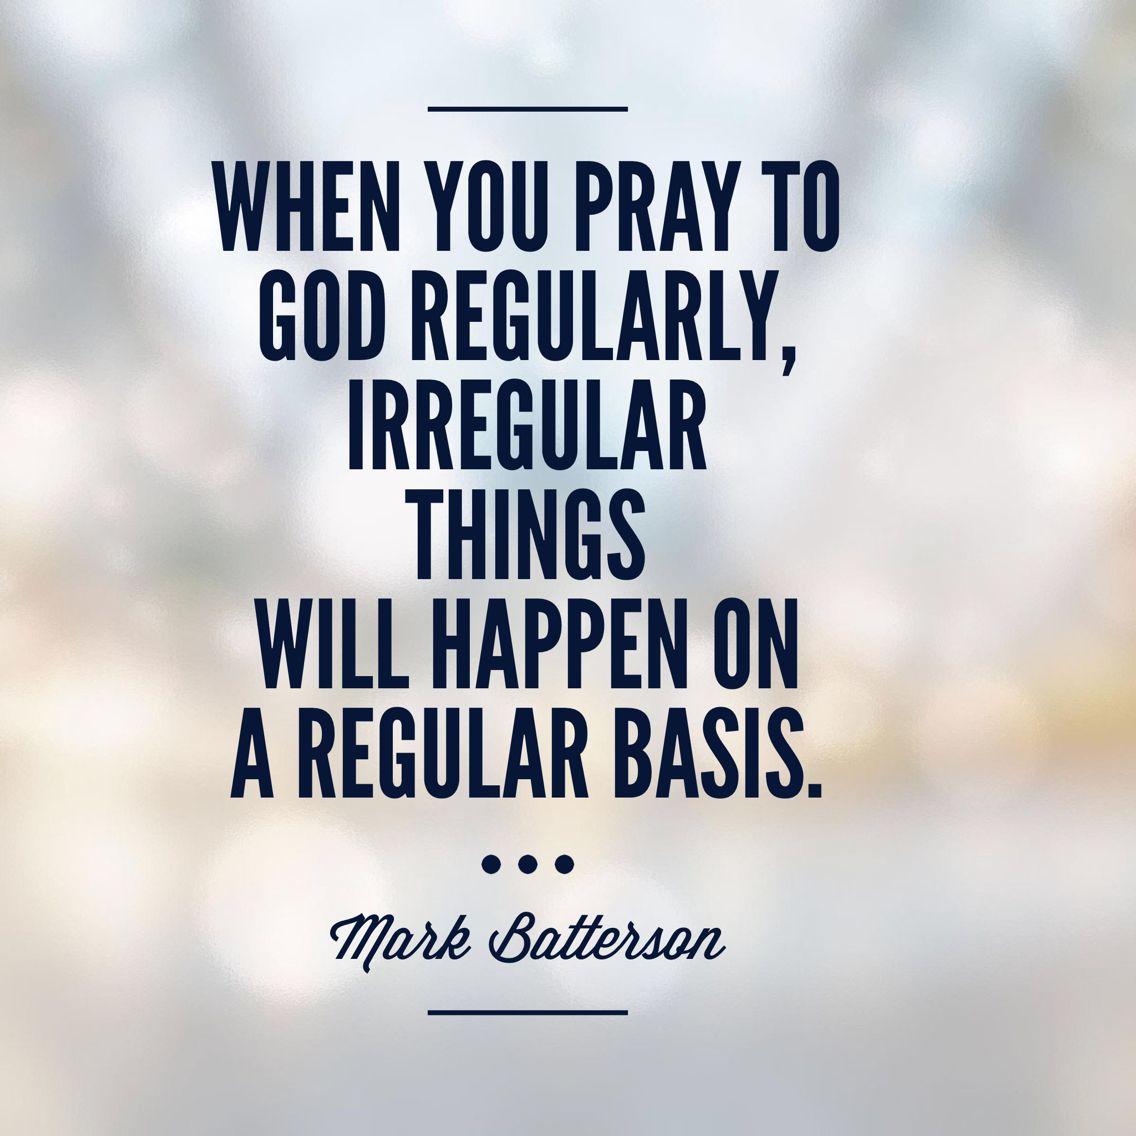 When you pray to God regularly, IRREGULAR things will